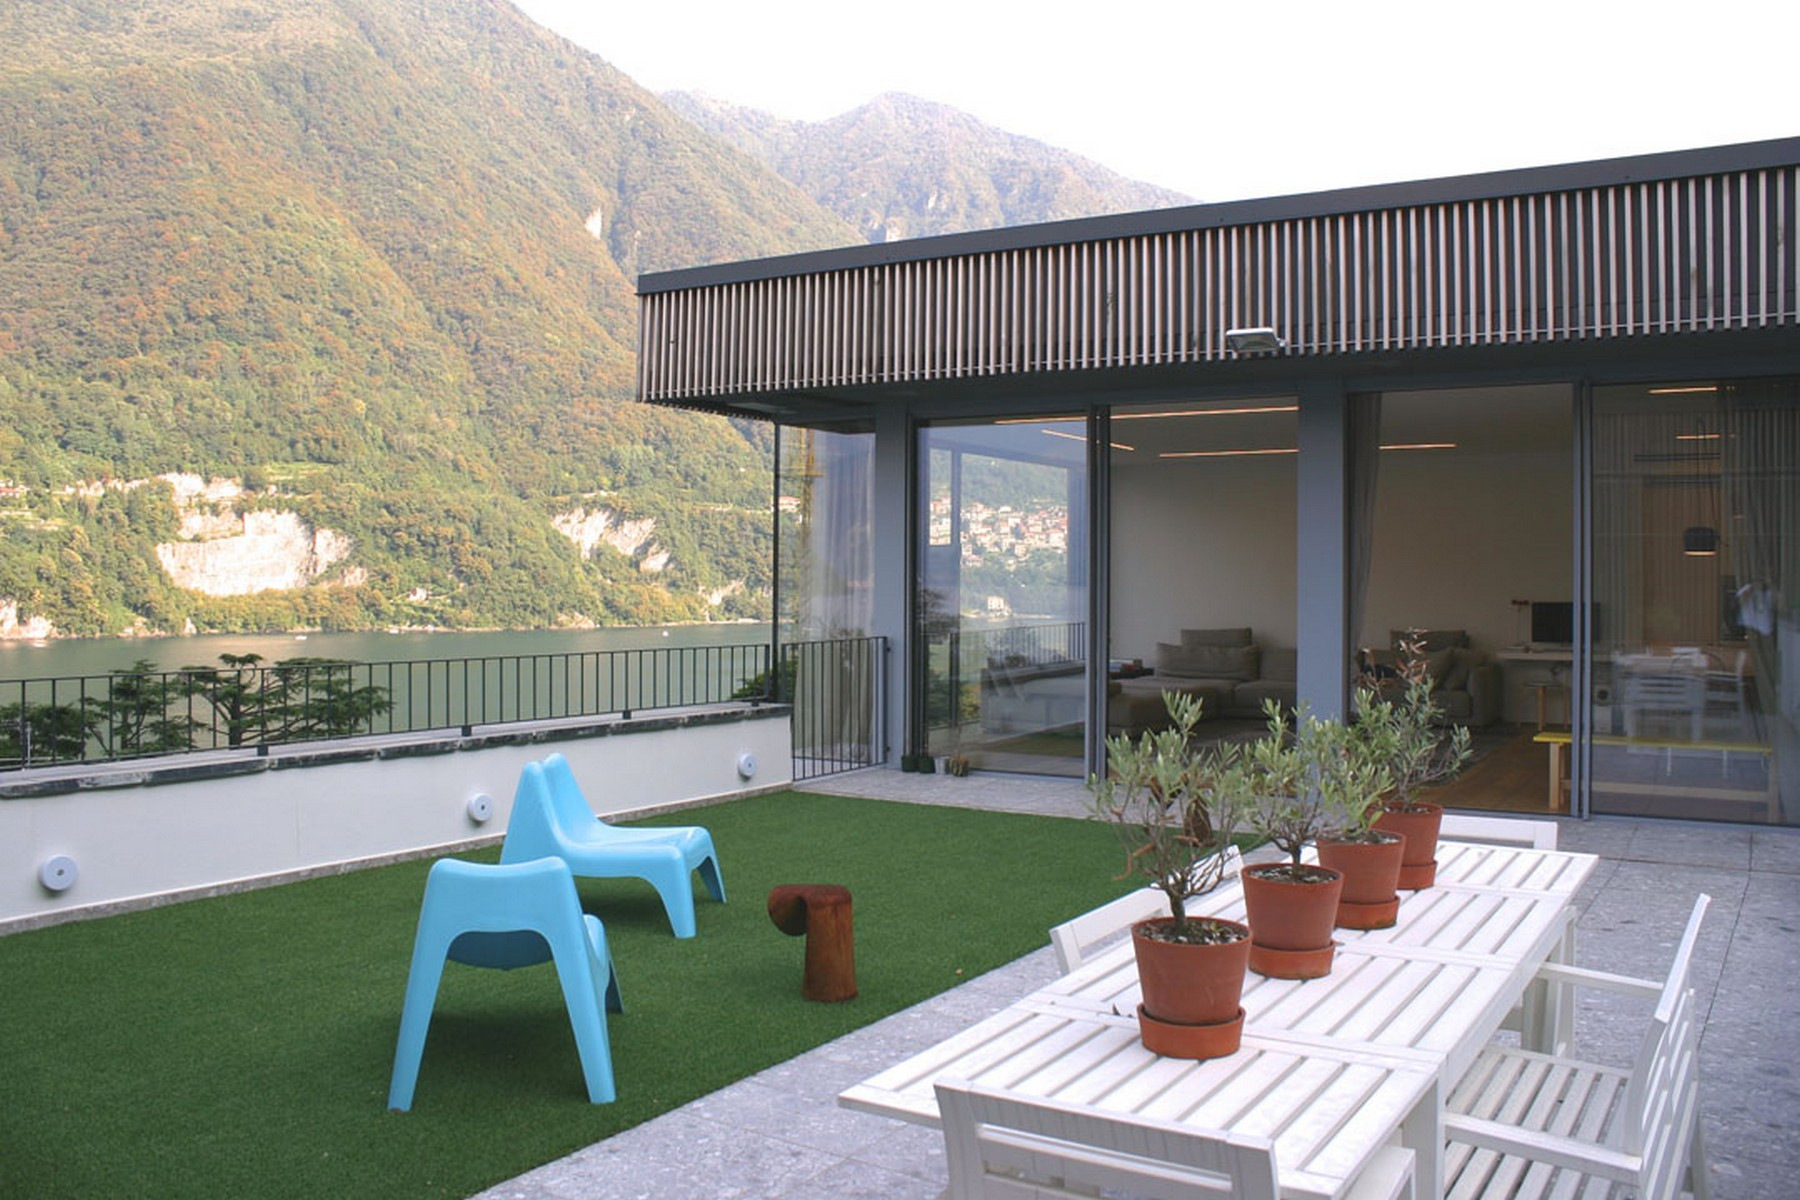 Additional photo for property listing at Prestigious newly built apartment Laglio Laglio, Como 22010 Italie